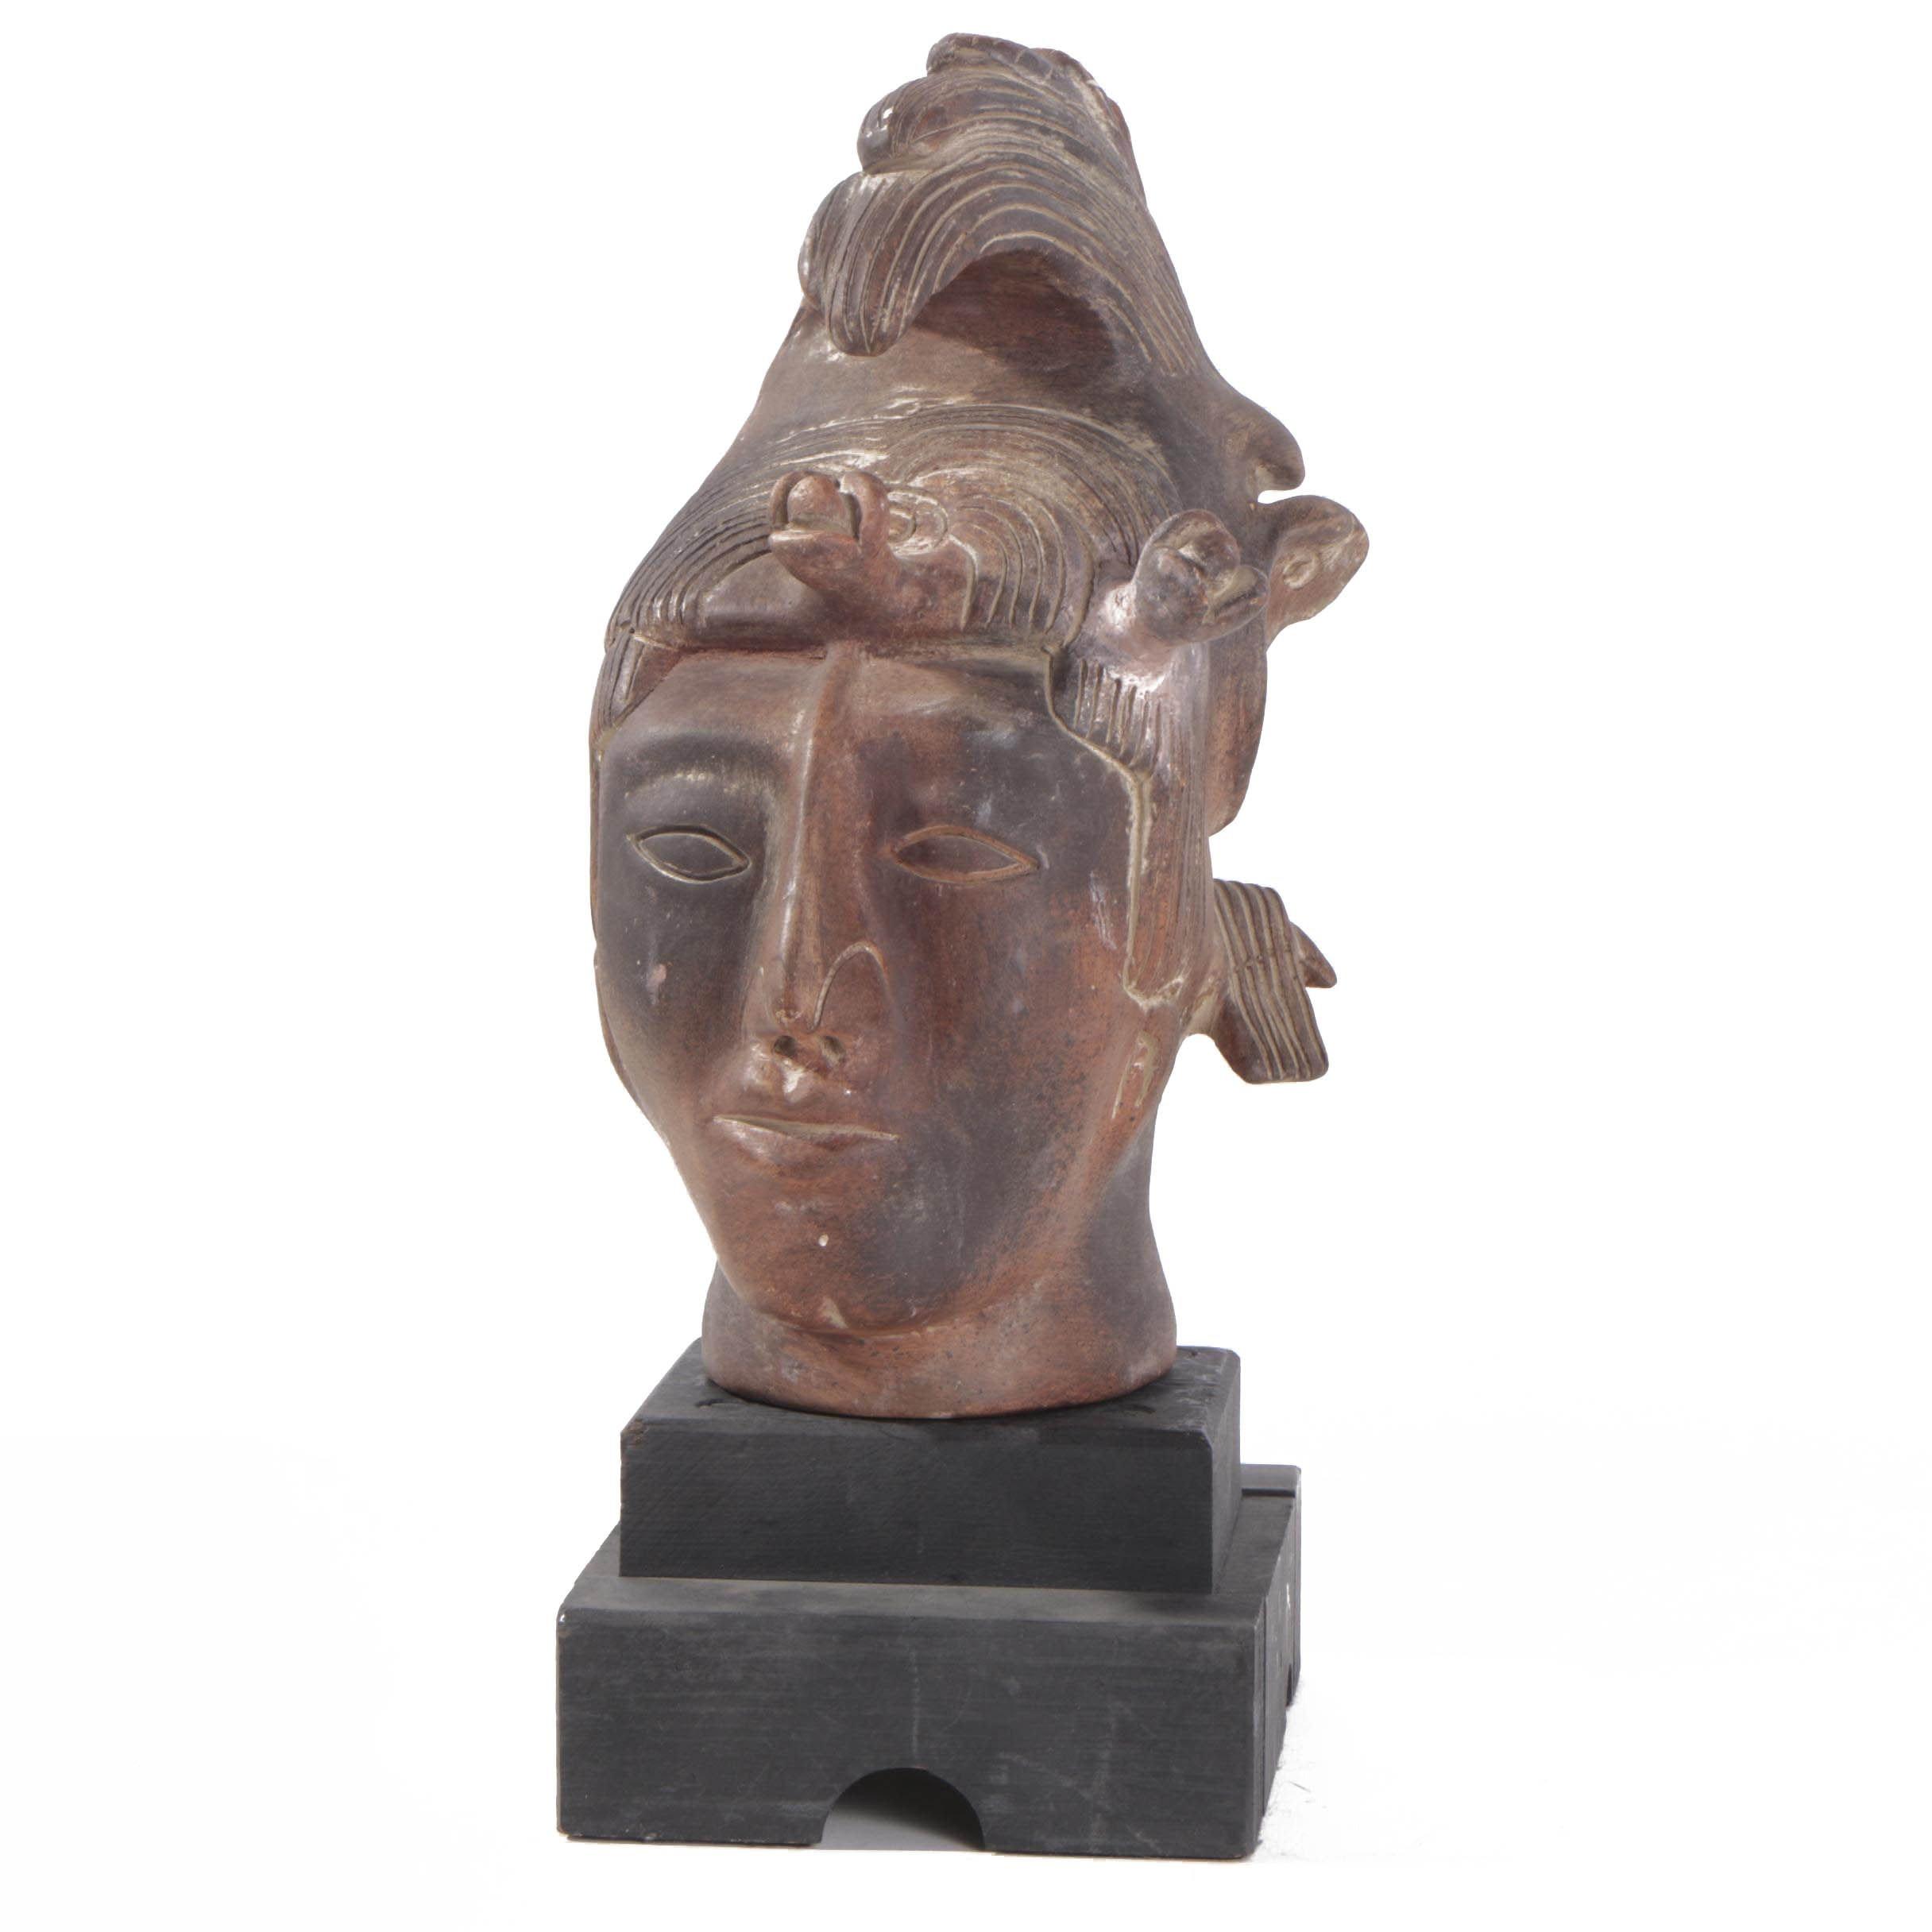 Mesoamerican Inspired Ceramic Head of K'inich Janaab' Pakal